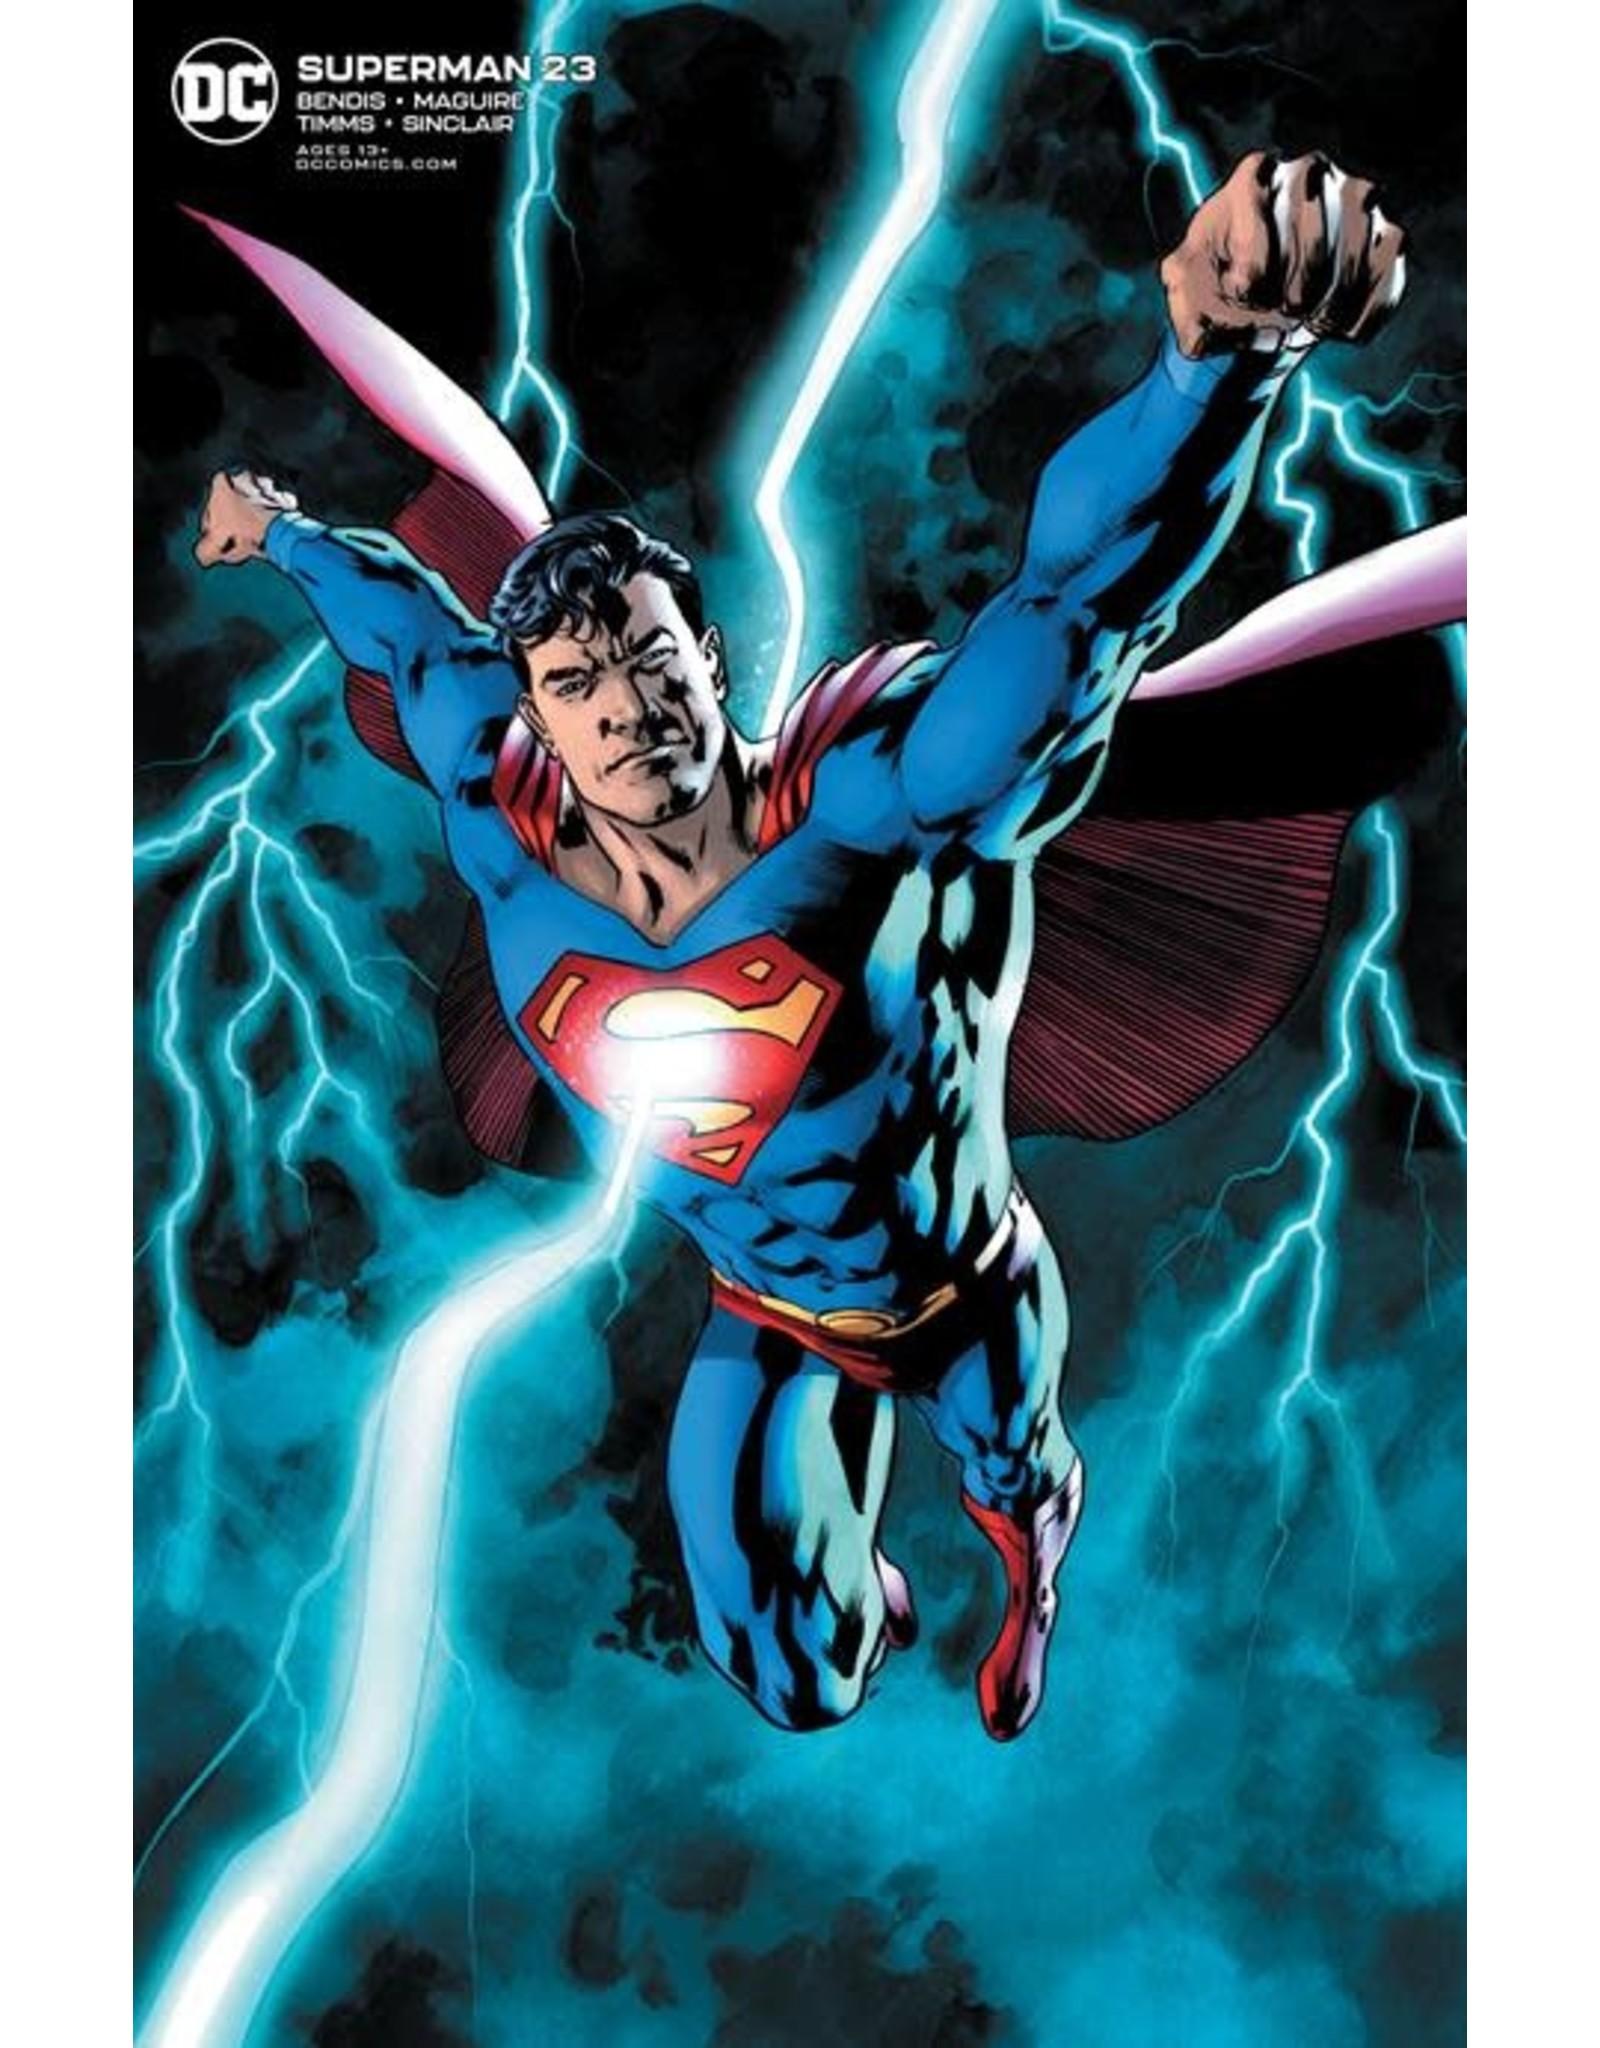 DC COMICS SUPERMAN #23 BRYAN HITCH VAR ED